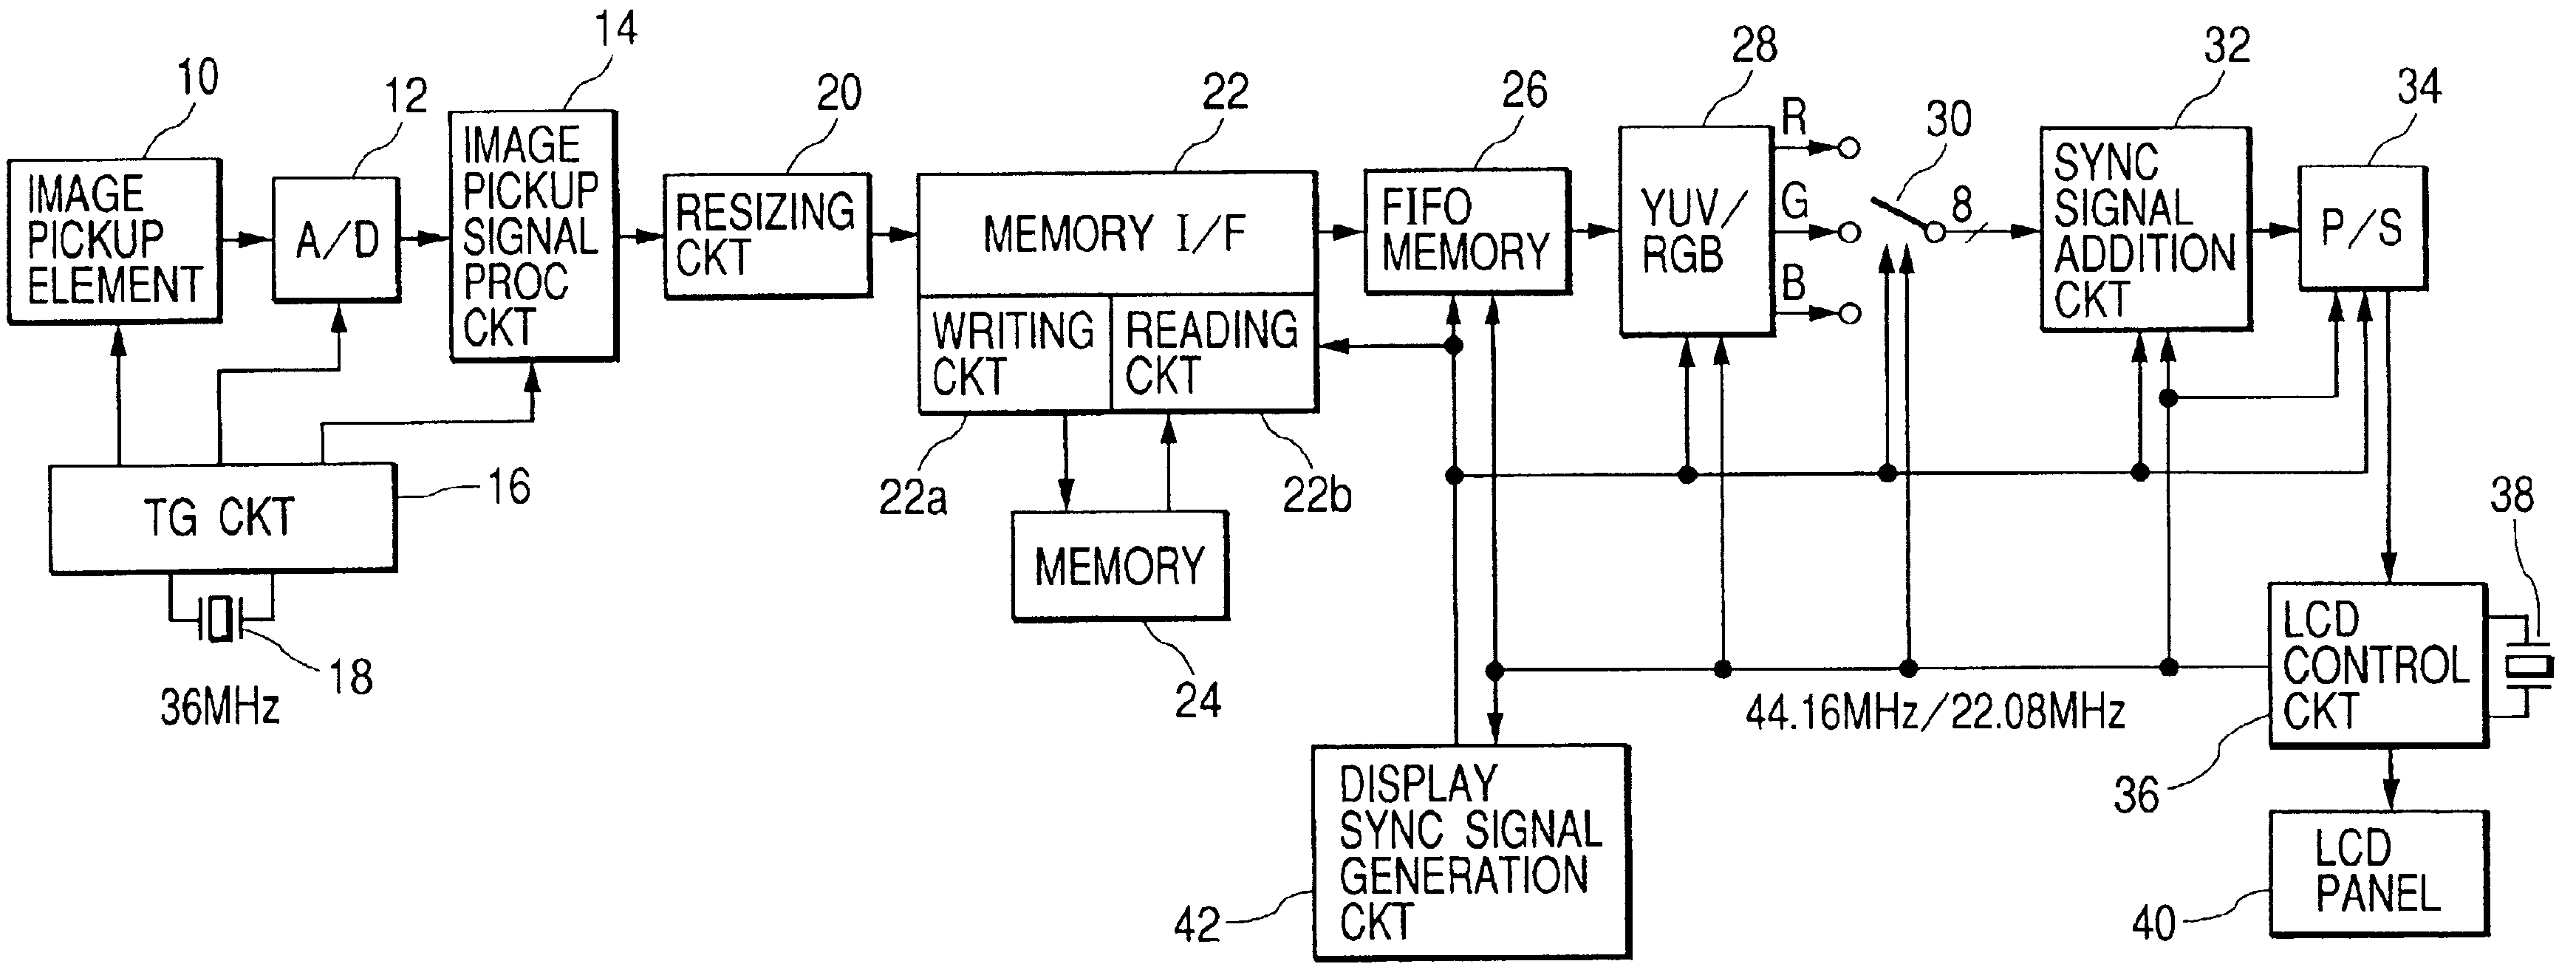 Patent Us7136110 Image Signal Processing Apparatus Google Patents The Quartz Crystal Oscillator Circuit Signalprocessing Drawing